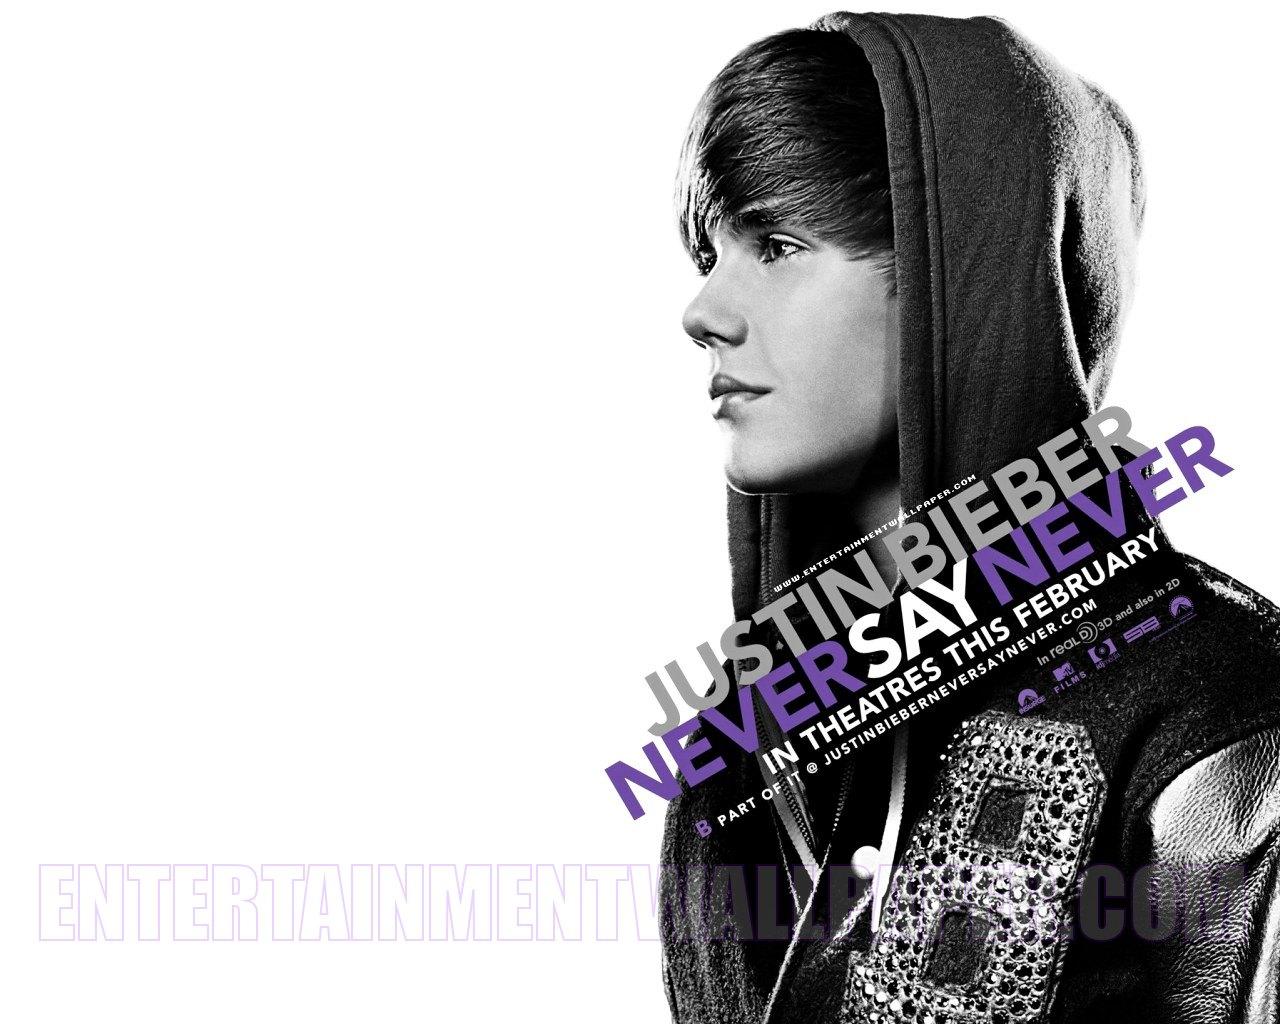 http://2.bp.blogspot.com/-puBWDBBdyj8/TlHtbhObMJI/AAAAAAAAAwI/yZR0512D67w/s1600/Justin+Bieber+Never+Say+Never.jpg